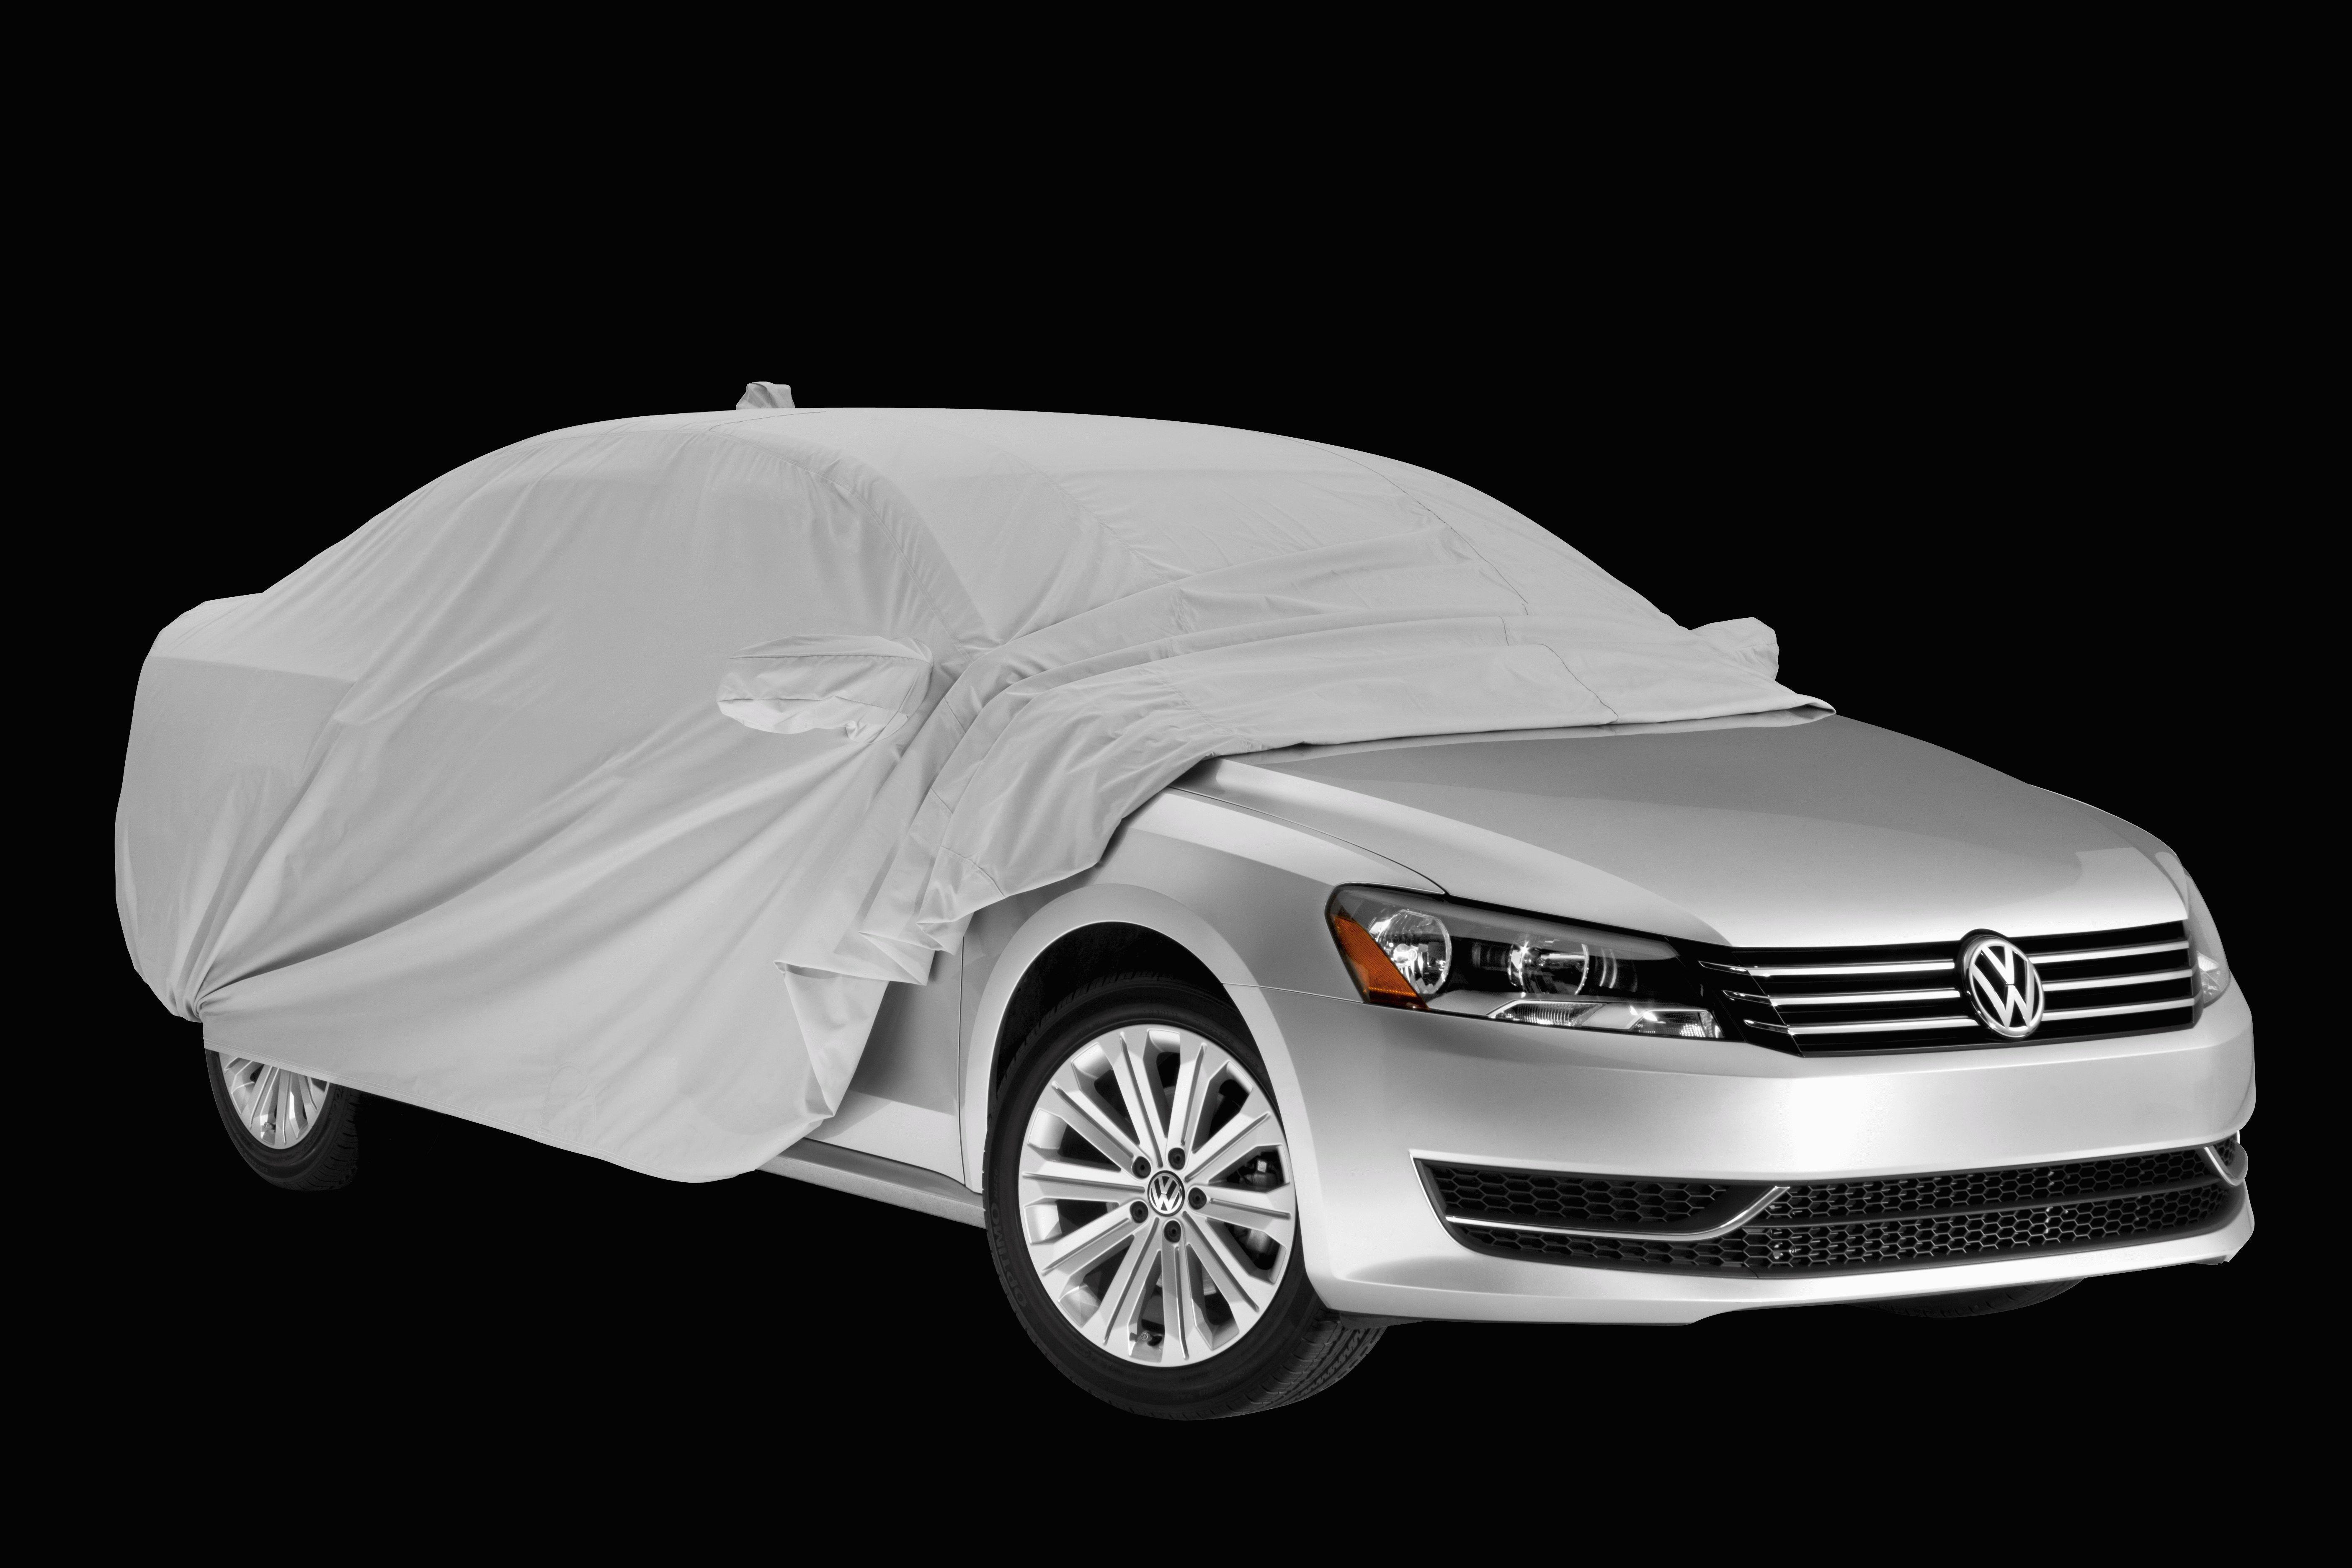 fms volkswagen com accessories blog psoriasisguru automotive interior jetta